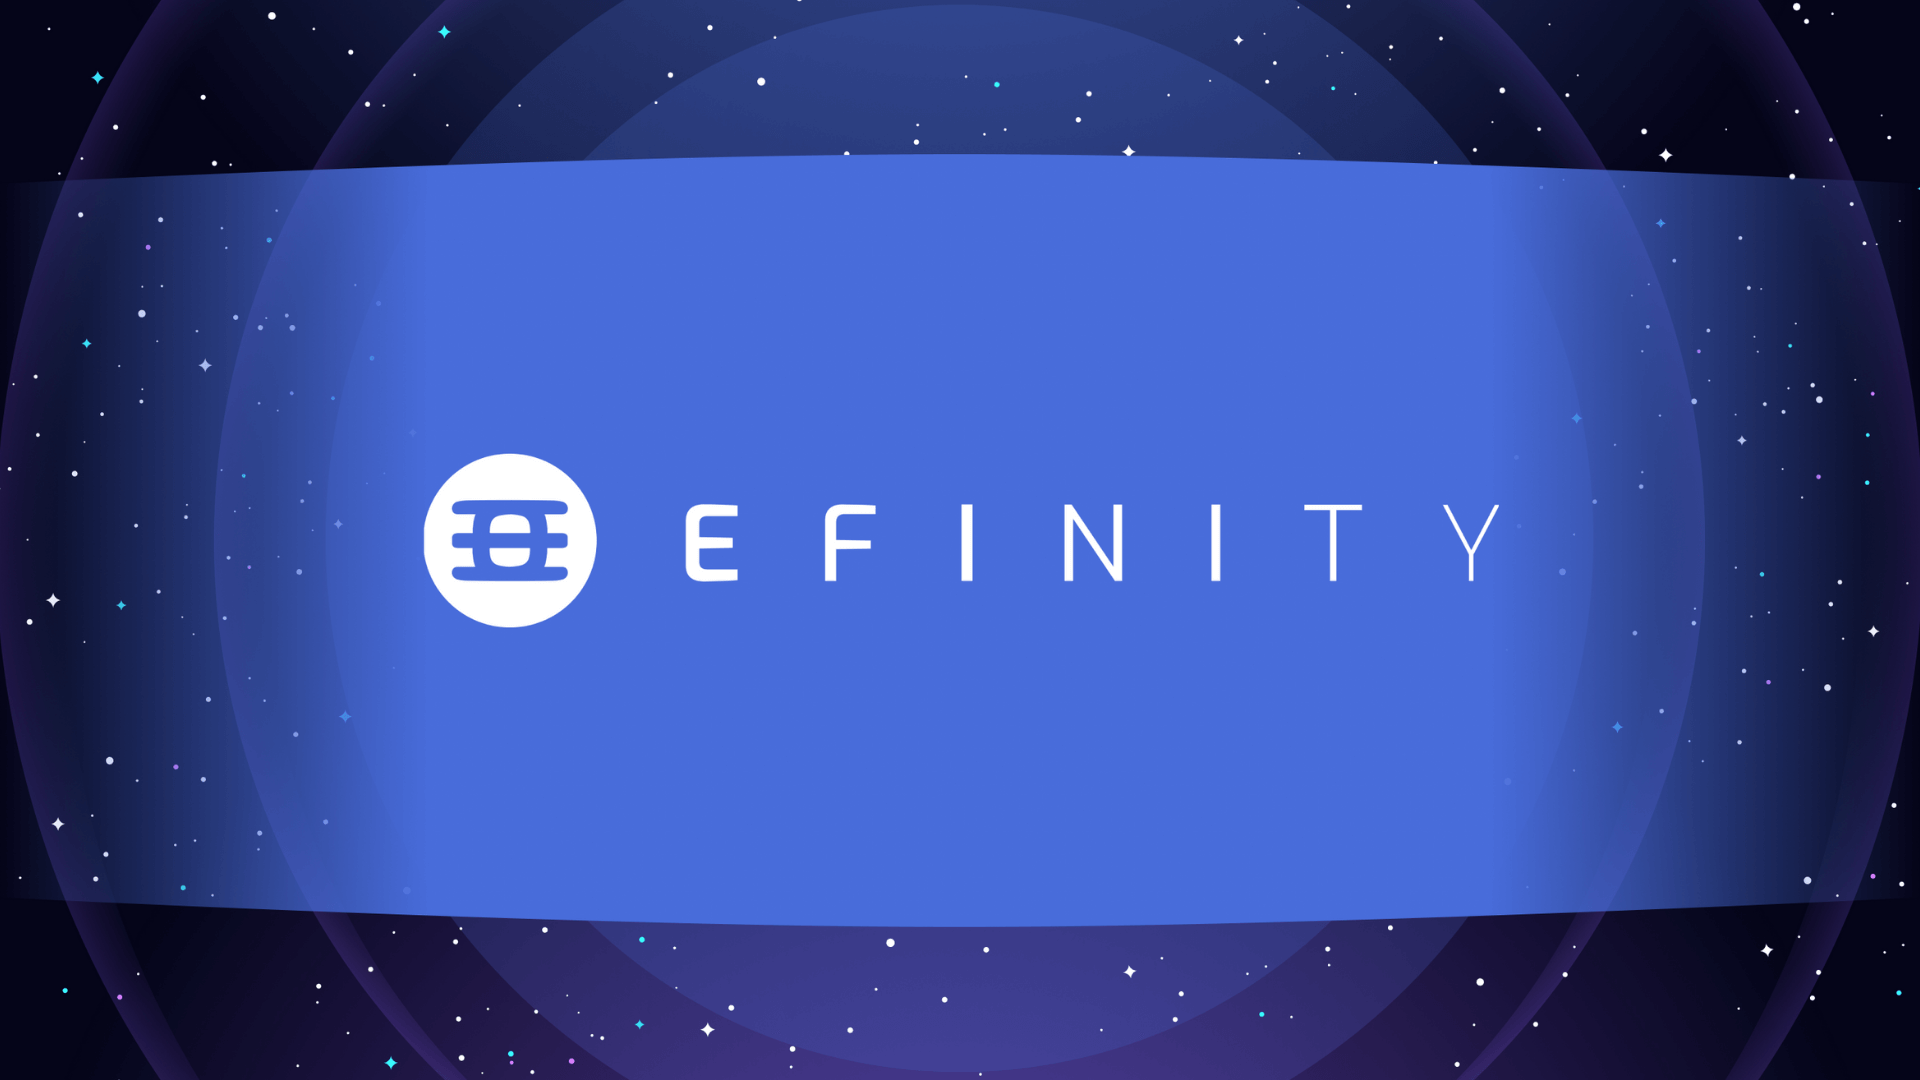 Enjin's Efinity (EFI) Token Launches on OKEx, Blockchain.com Exchange, Crypto.com, CoinList